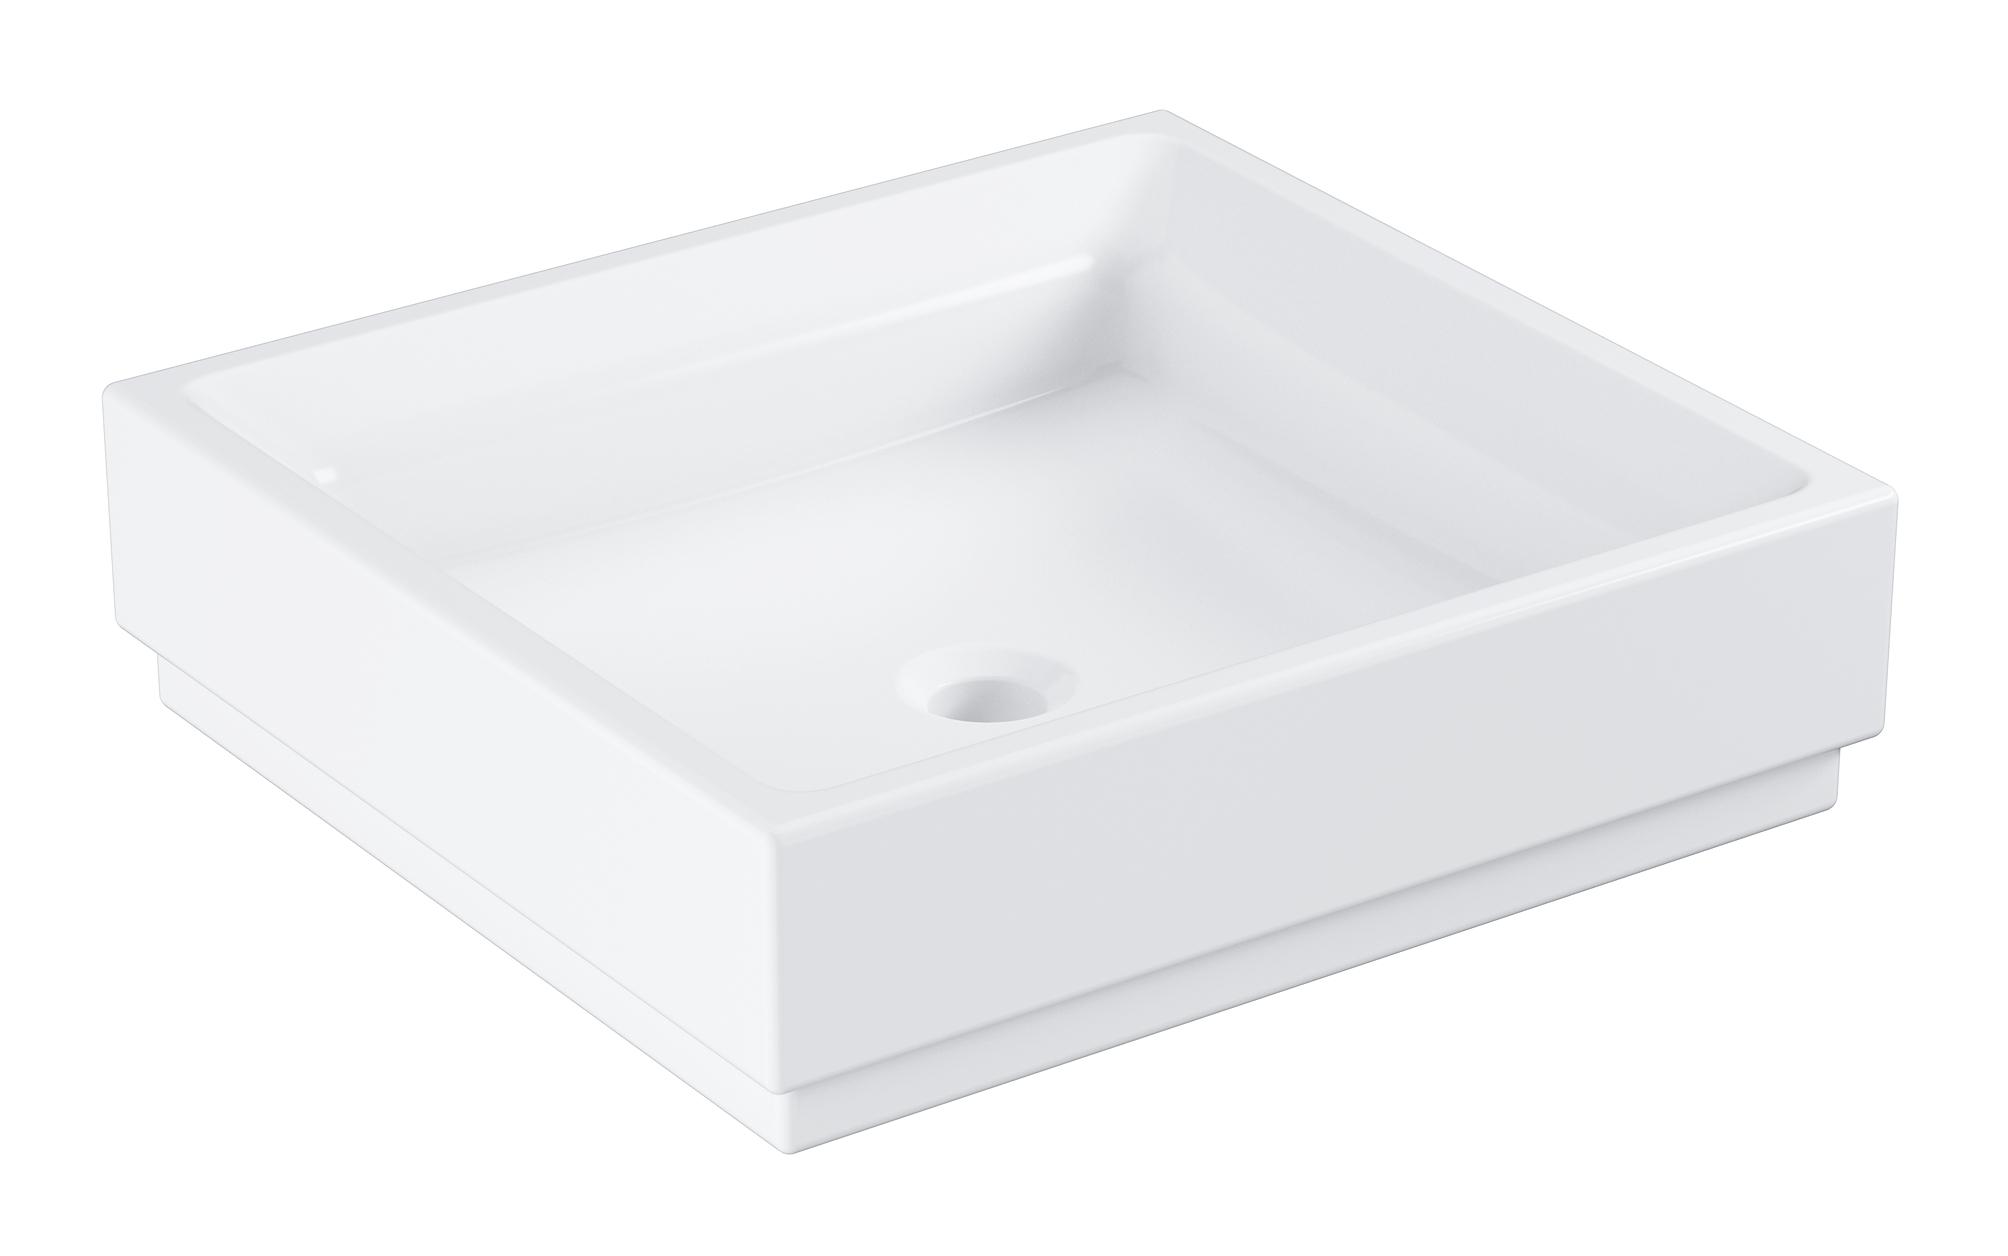 Раковина GROHE Cube Ceramic, свободностоящая, без перелива 50 см, альпин-белый (3948100H)